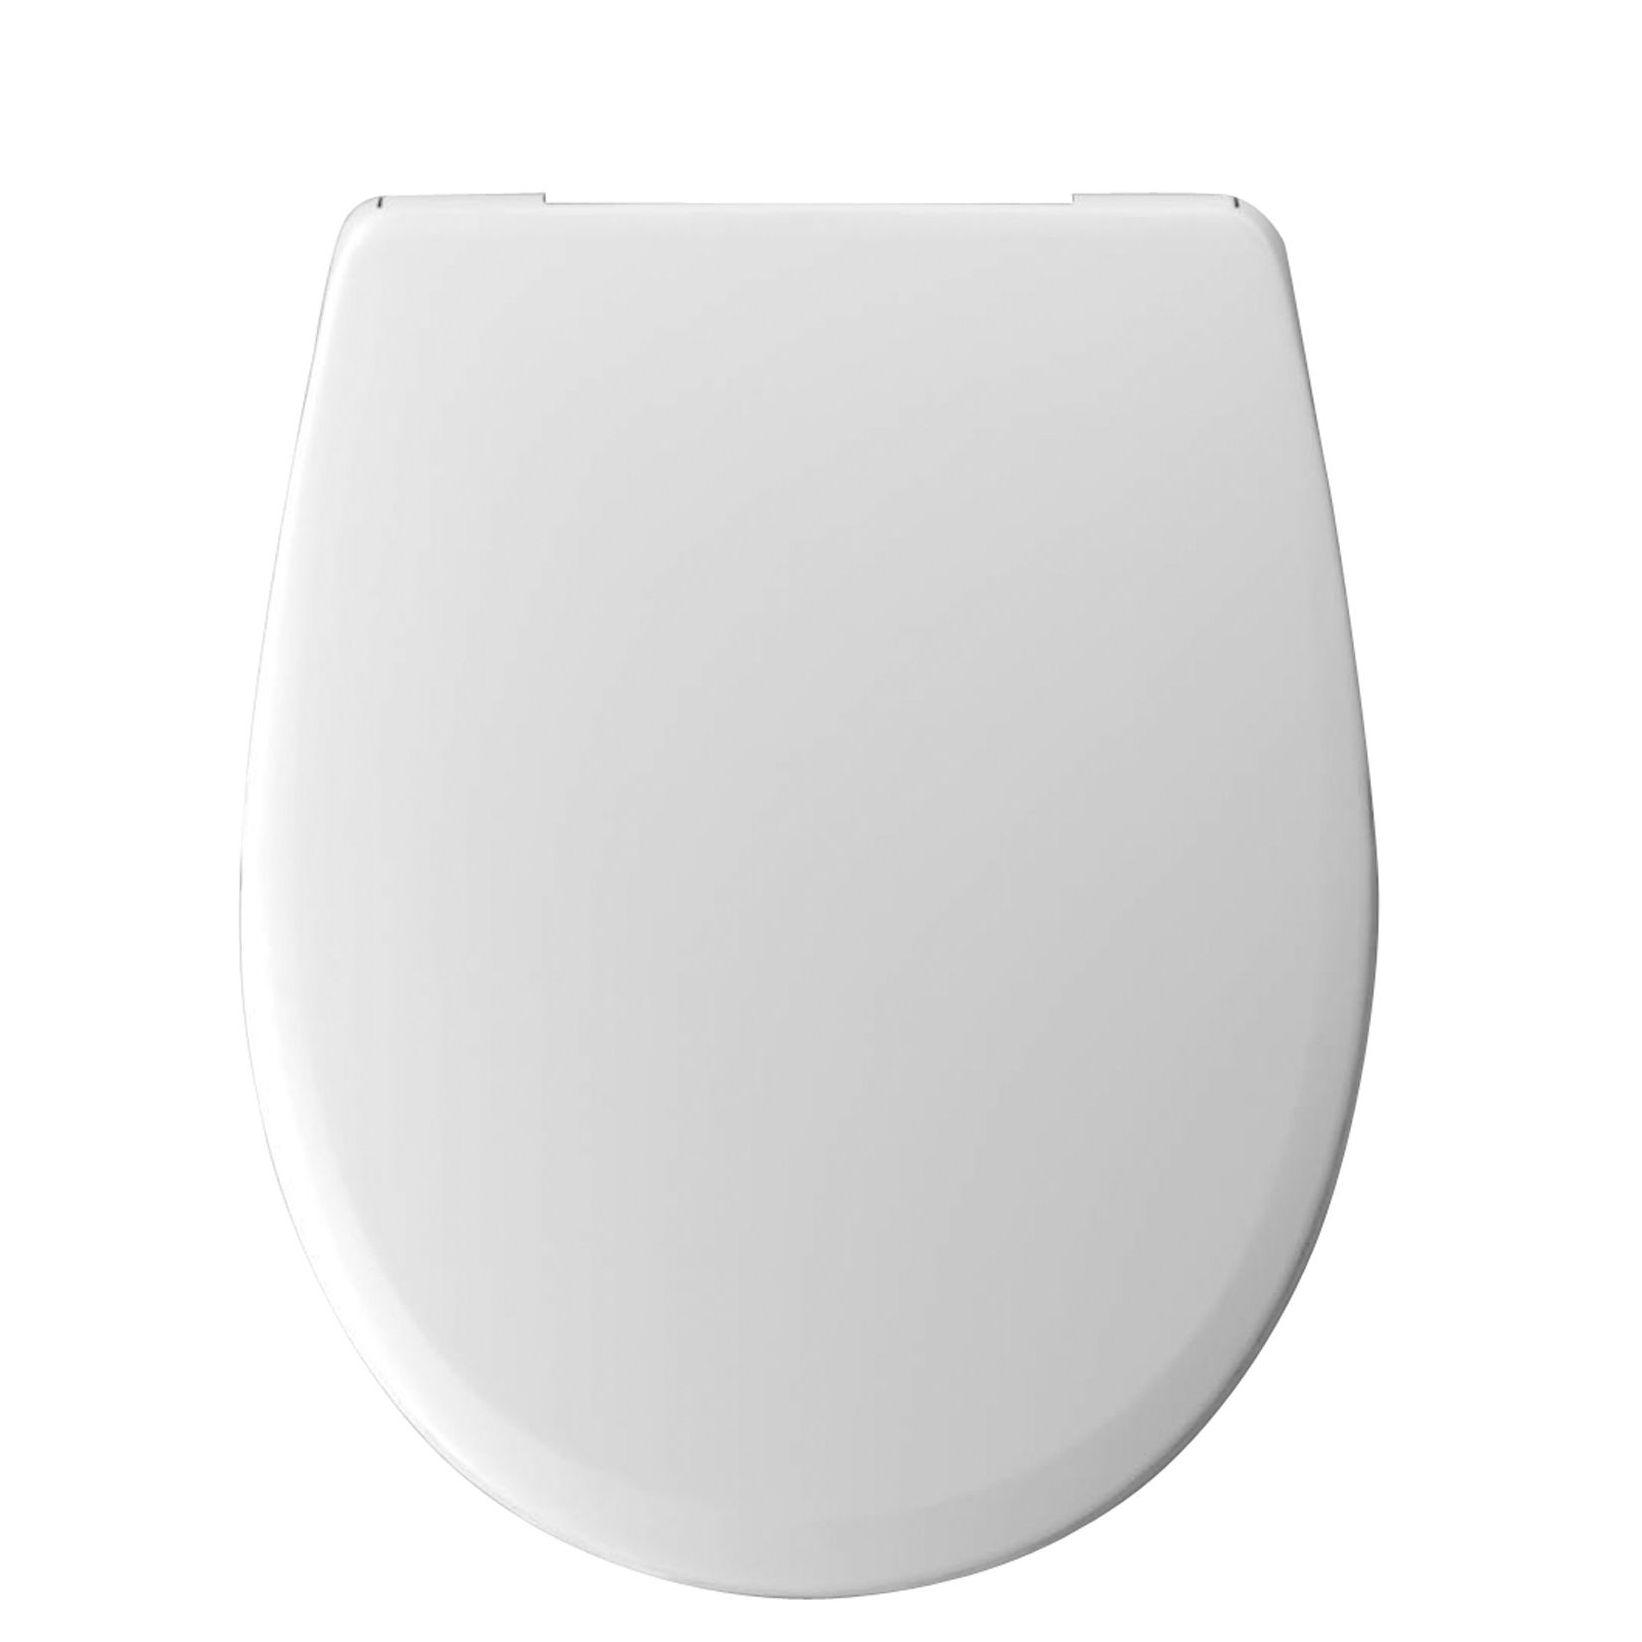 Toilet Seats Toilet Seat Fittings Diy At B Amp Q